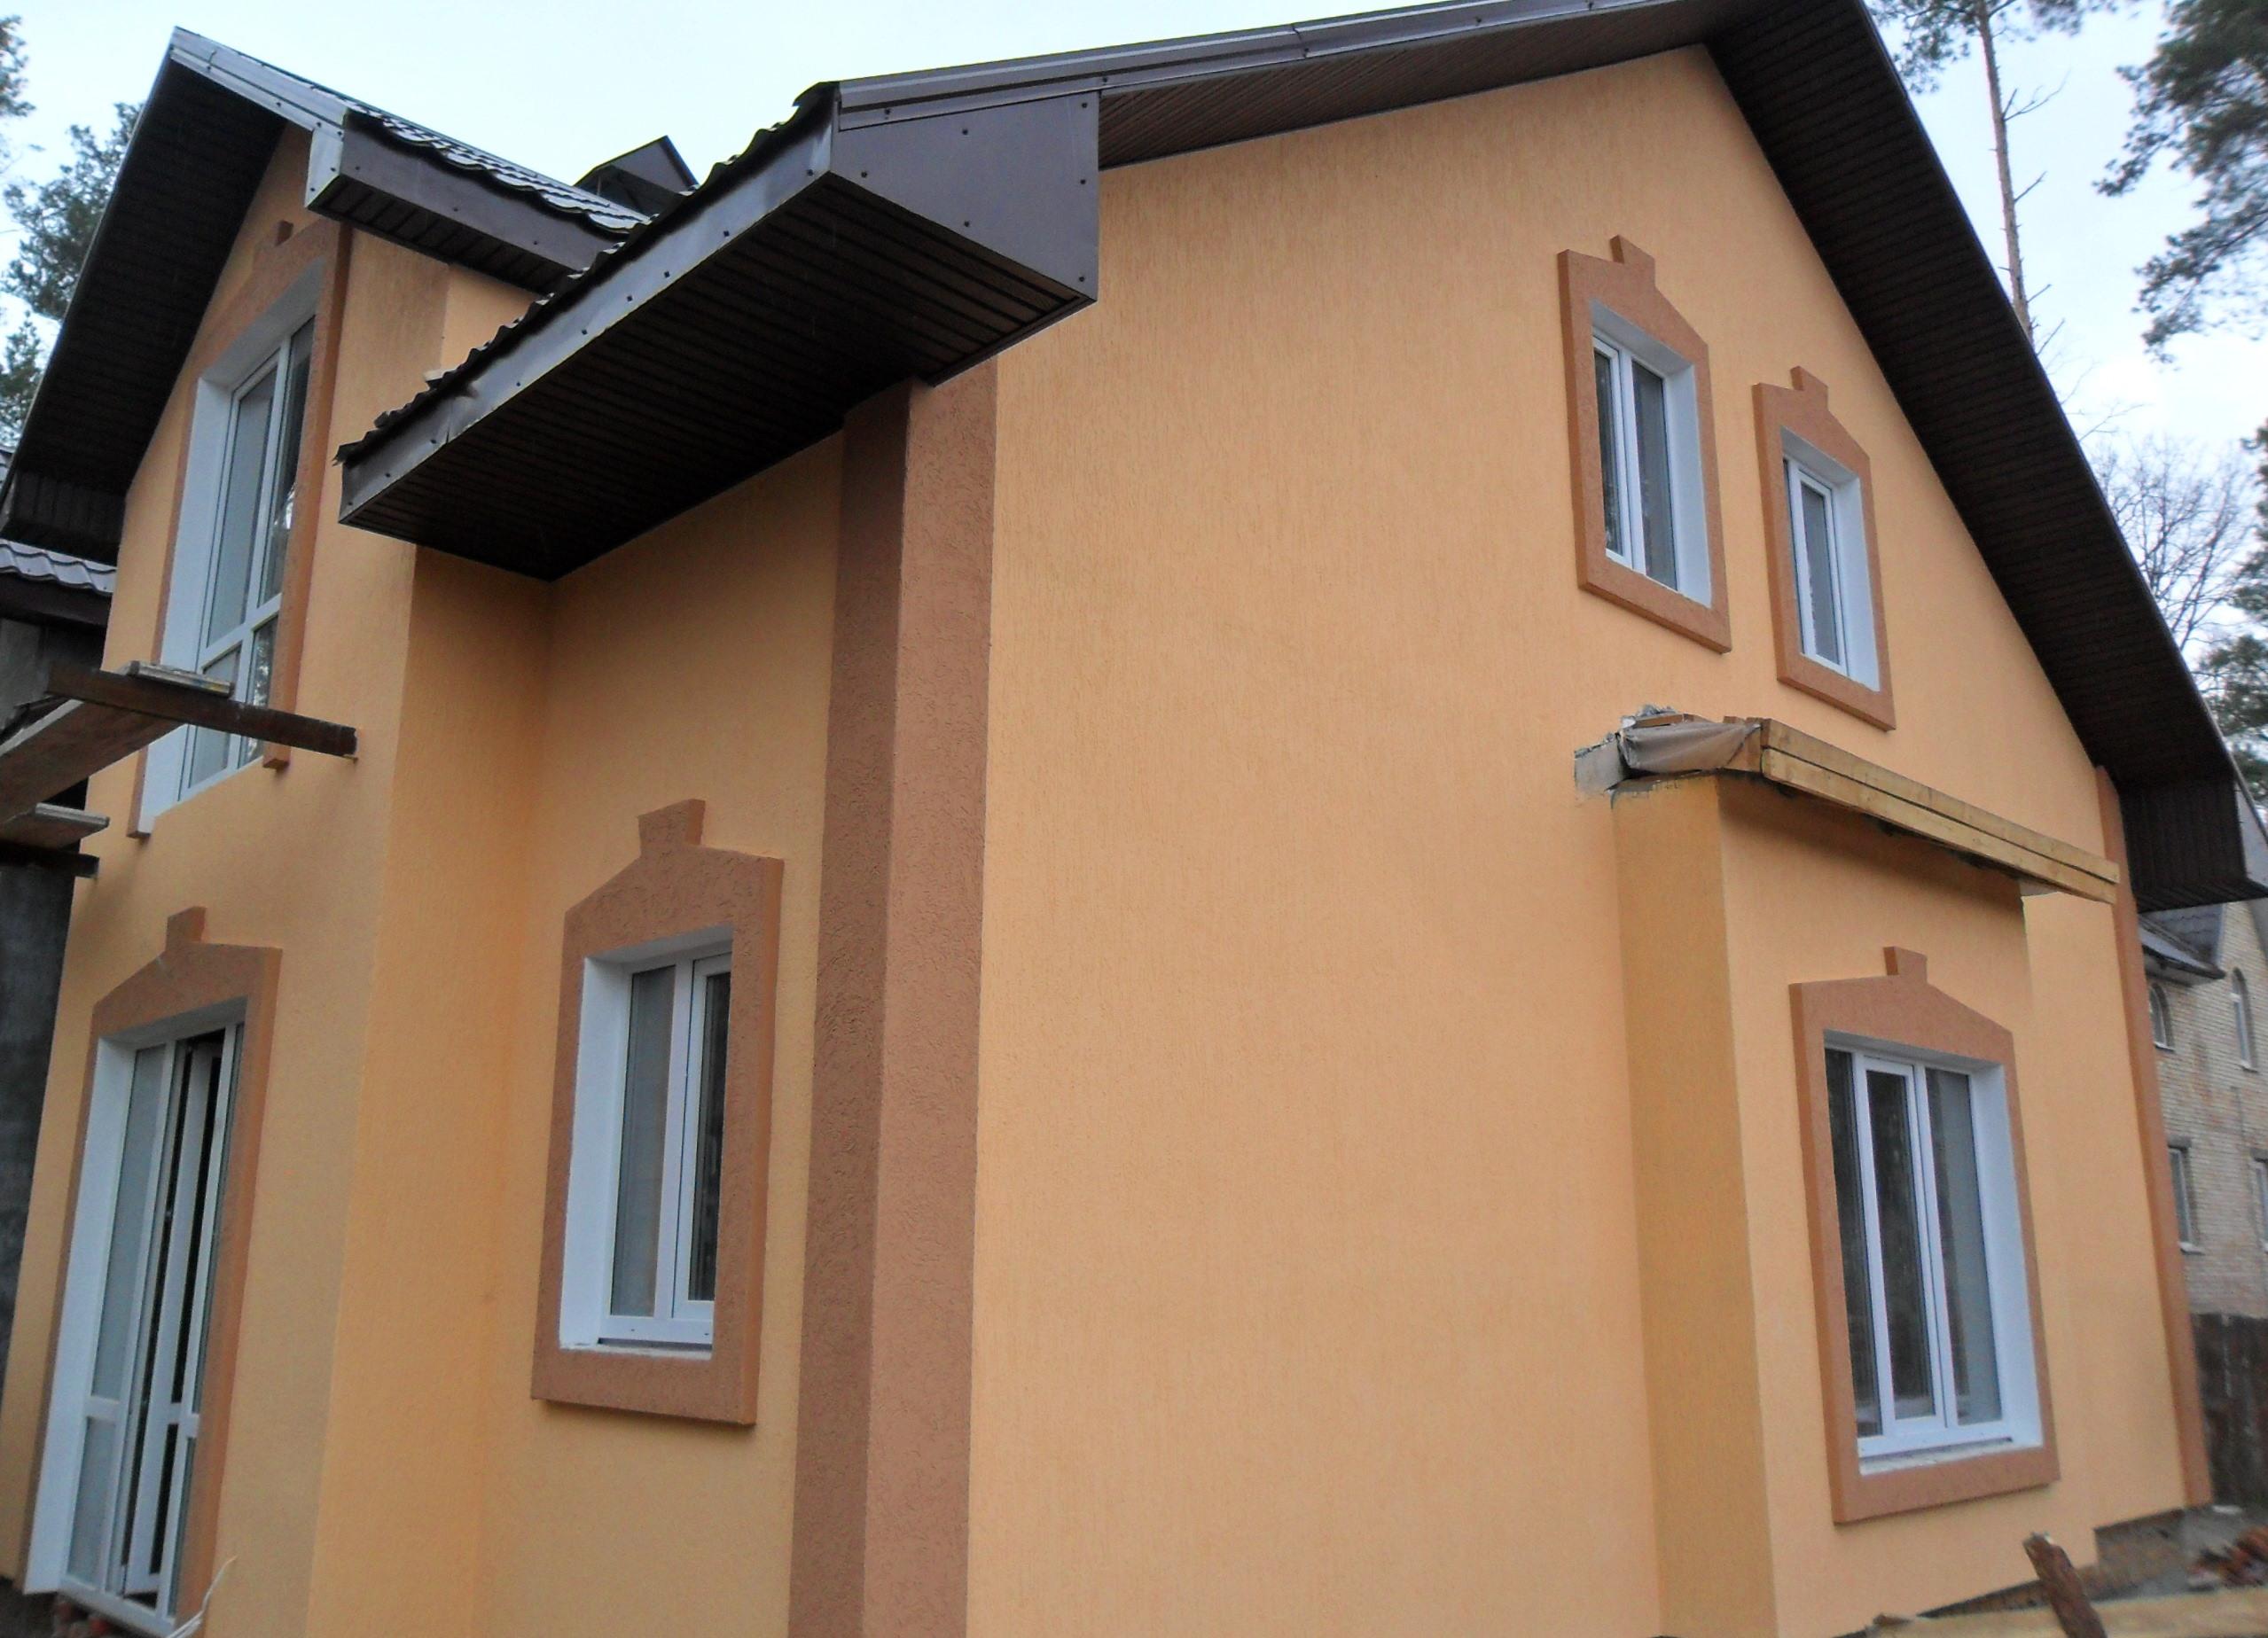 Штукатурка фасадной части дома - 1